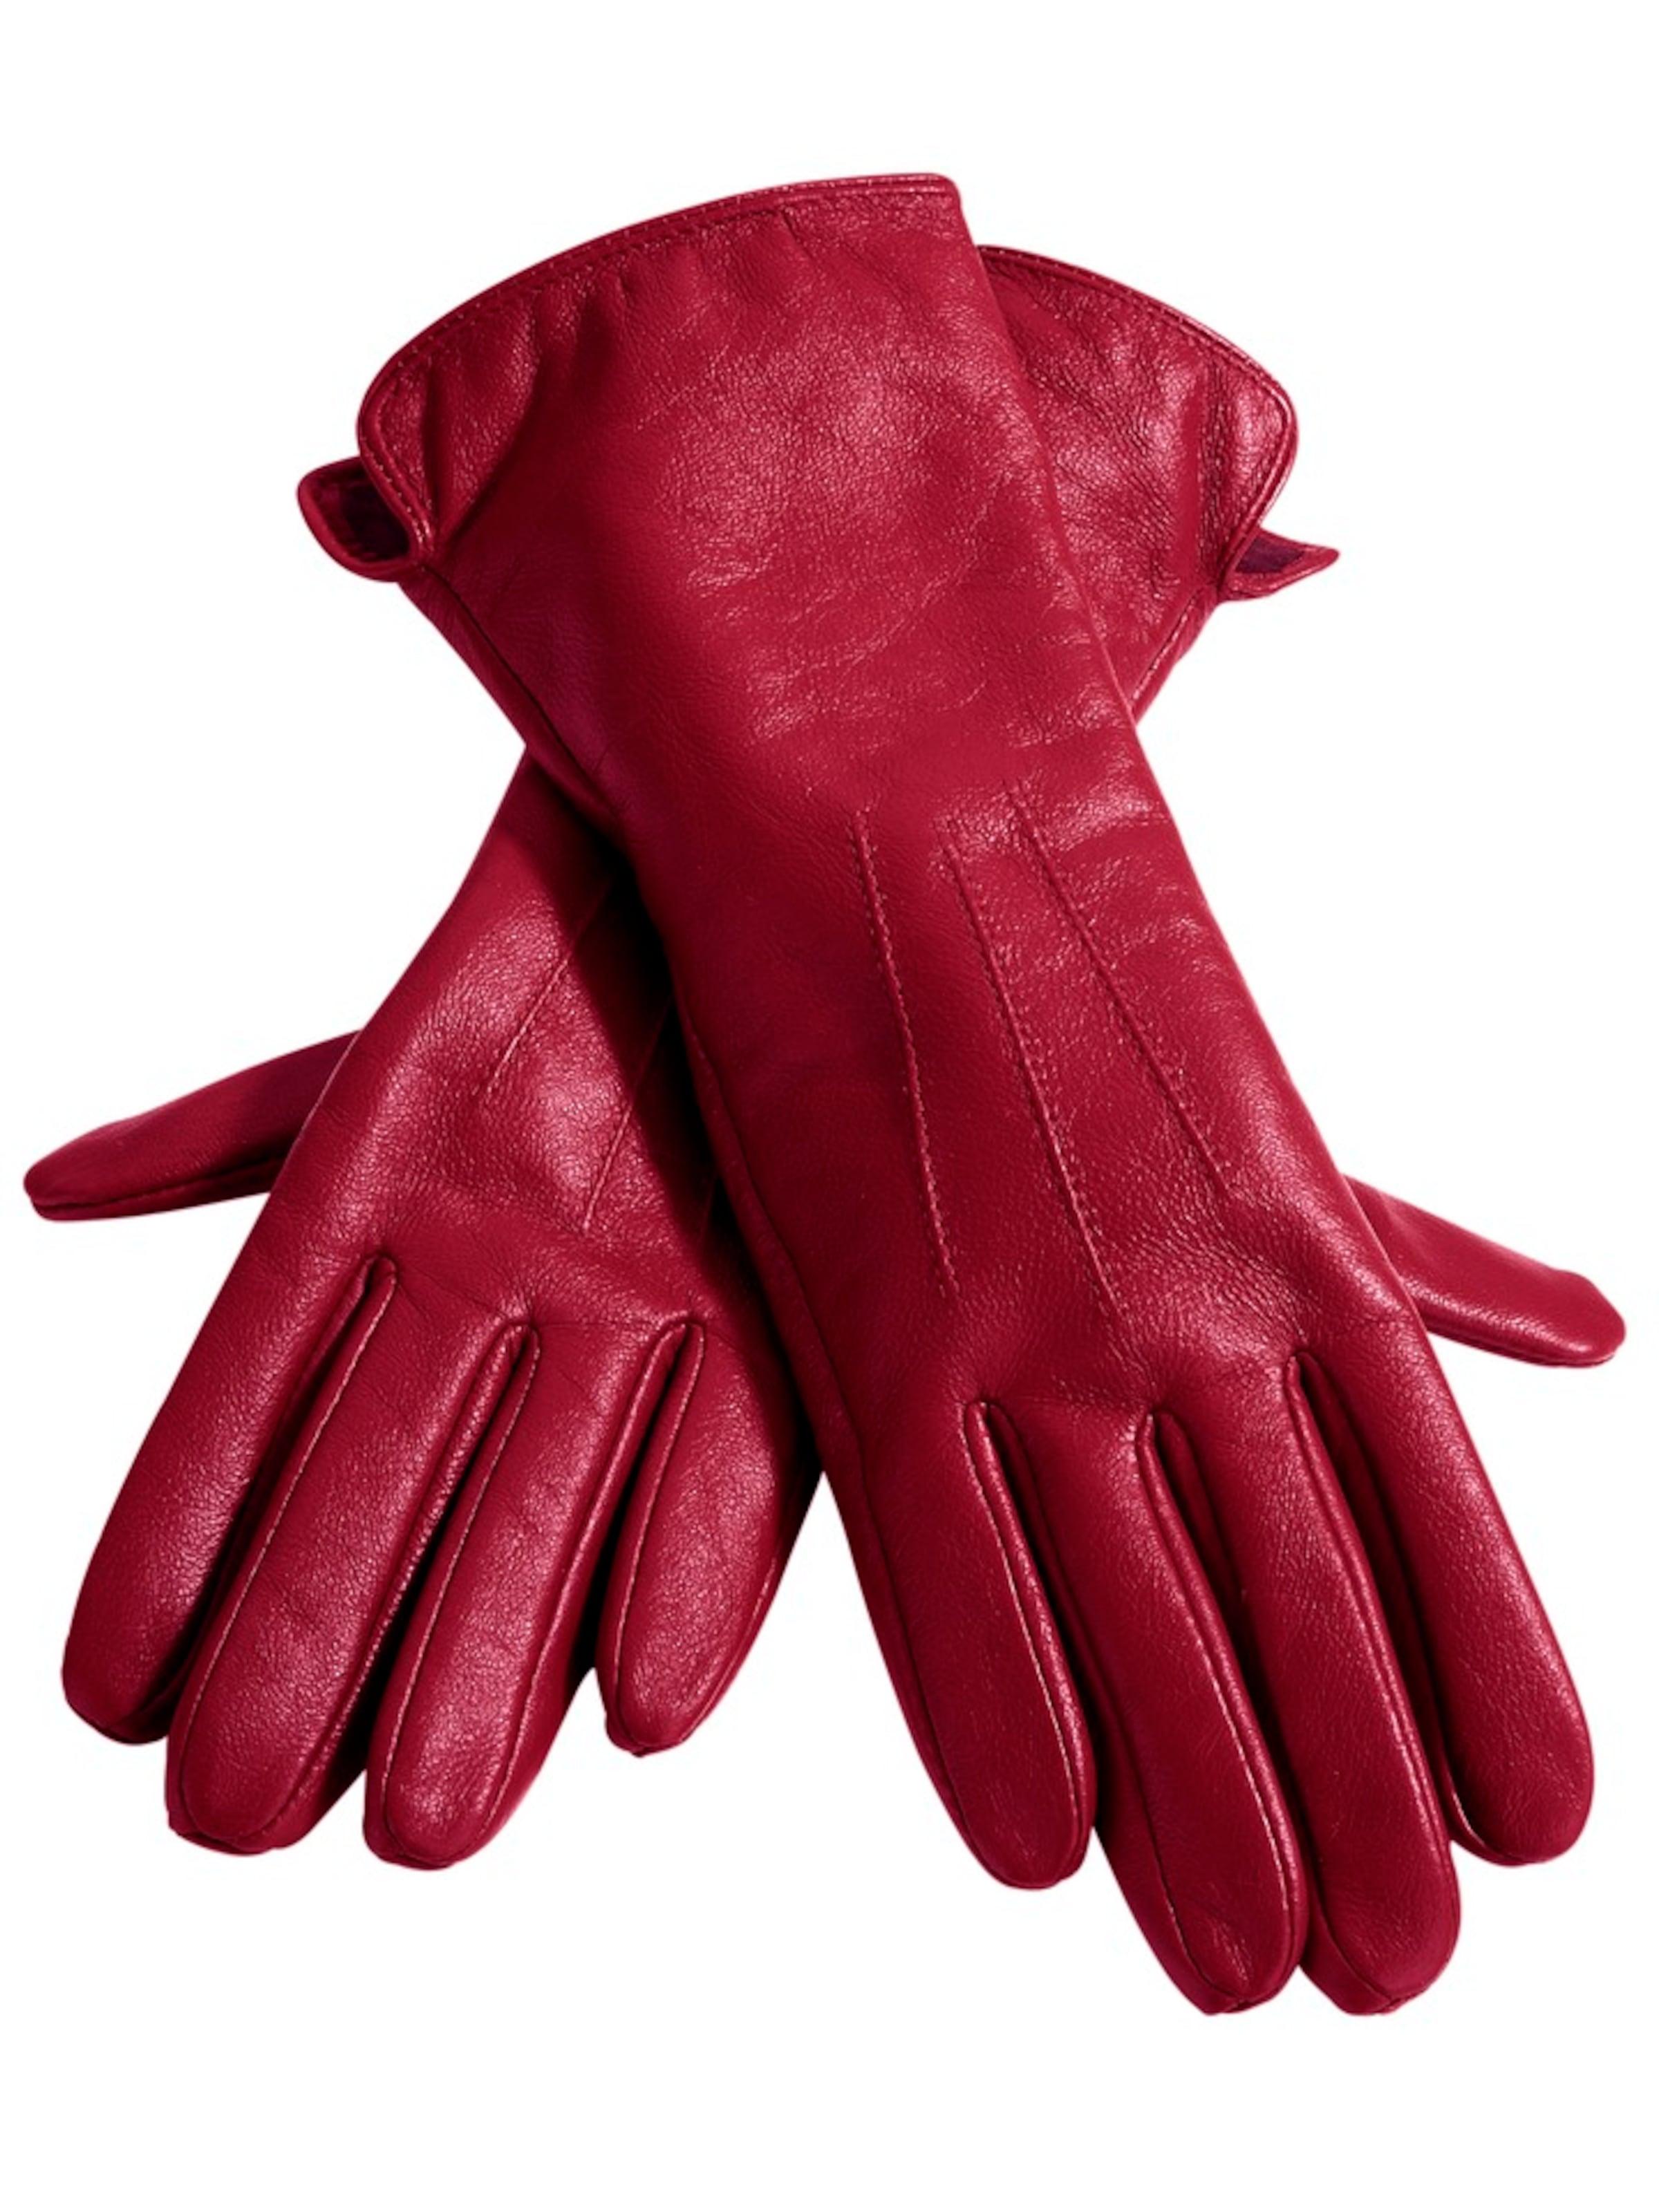 In Handschuhe In Rot Heine Handschuhe Handschuhe Rot Rot Heine In Heine Heine Handschuhe In vNym0Pnw8O